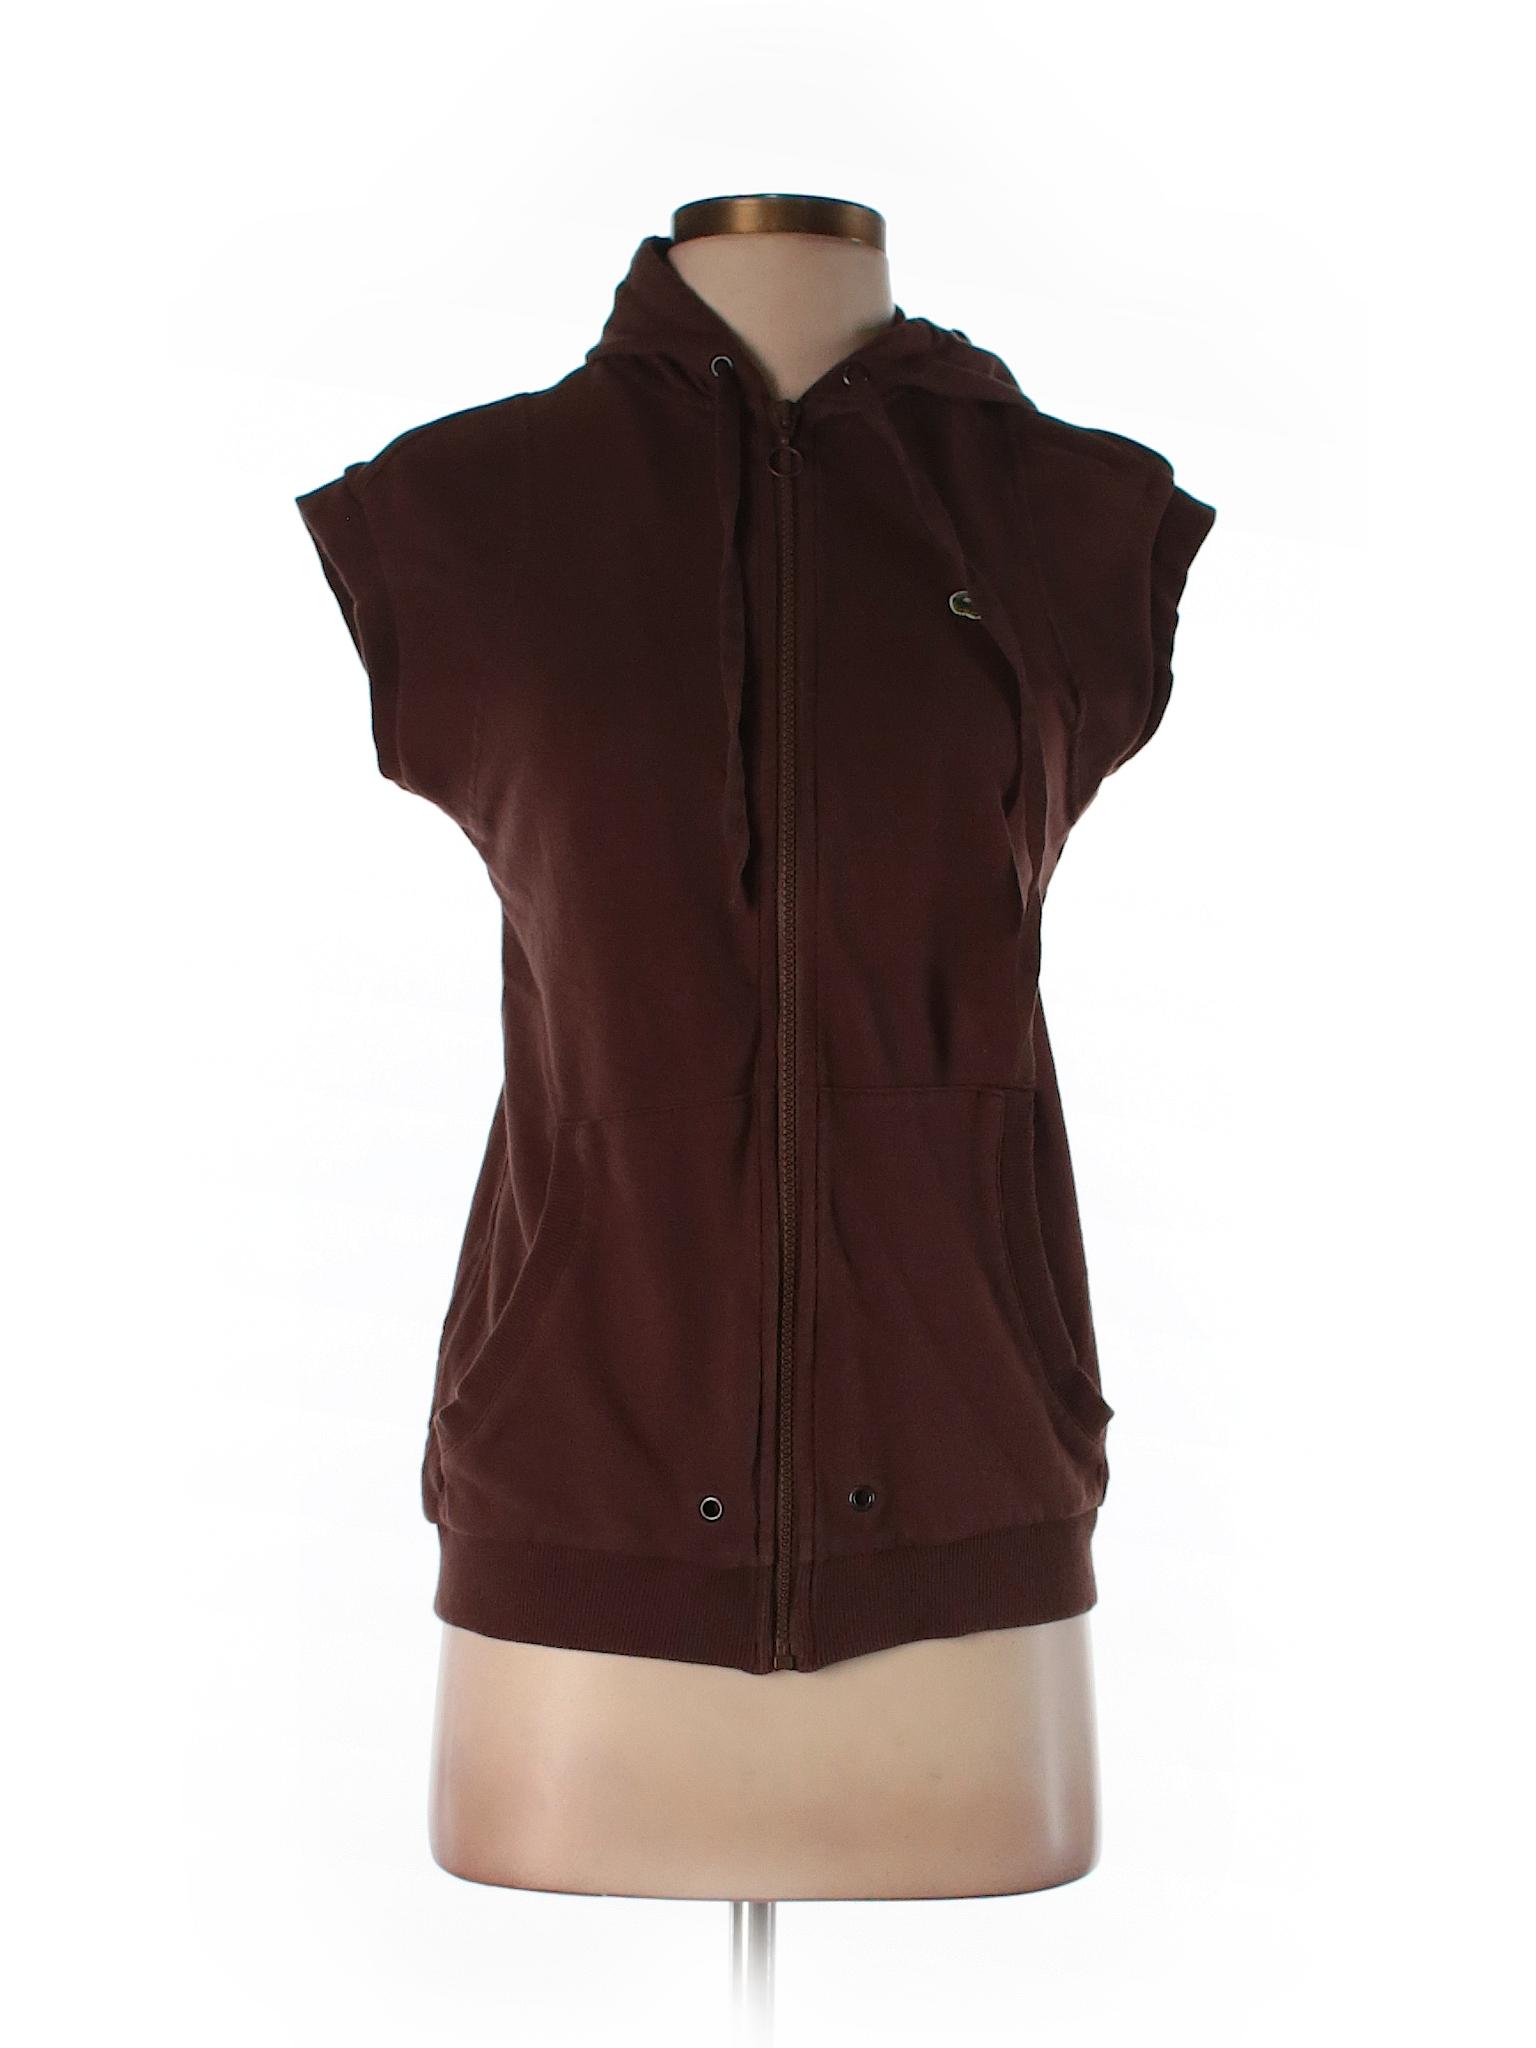 lacoste zip up hoodie 90 off only on thredup. Black Bedroom Furniture Sets. Home Design Ideas